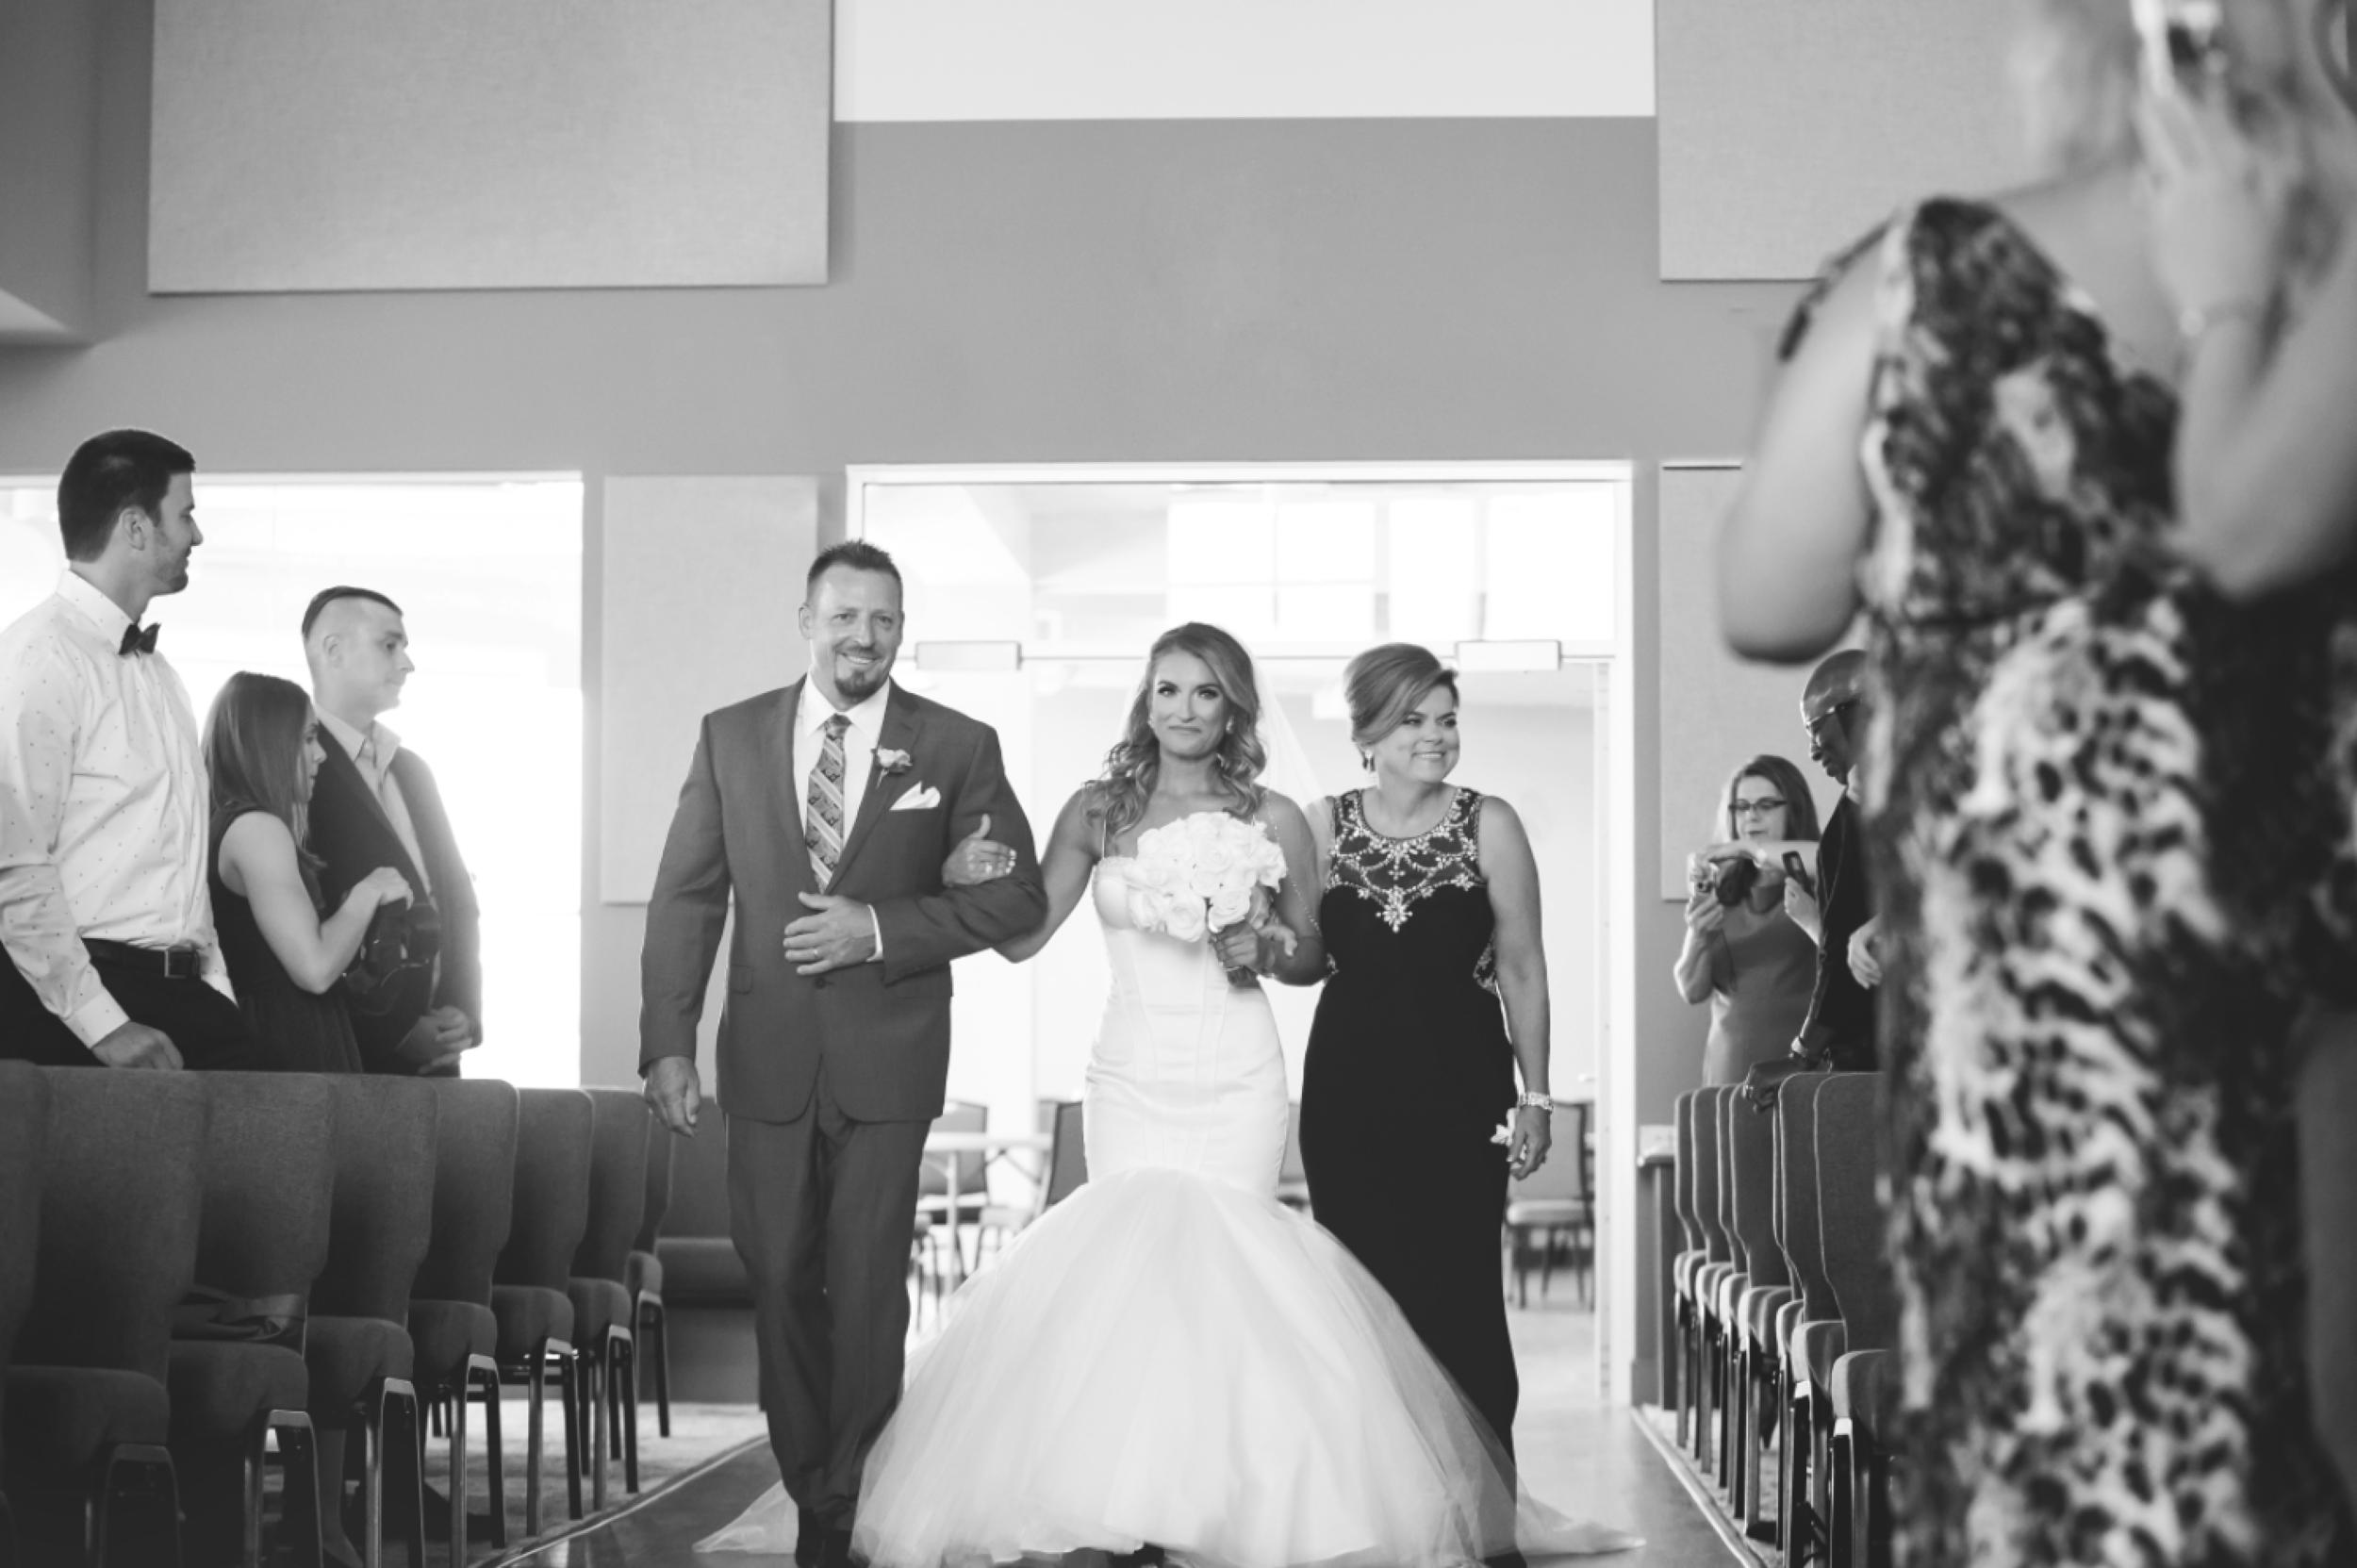 Wedding-Burlington-Convention-Center-Burlington-Oakville-Toronto-Hamilton-Niagara-Wedding-Photographer-Photography-Moments-by-Lauren-Photo-Image-16.png